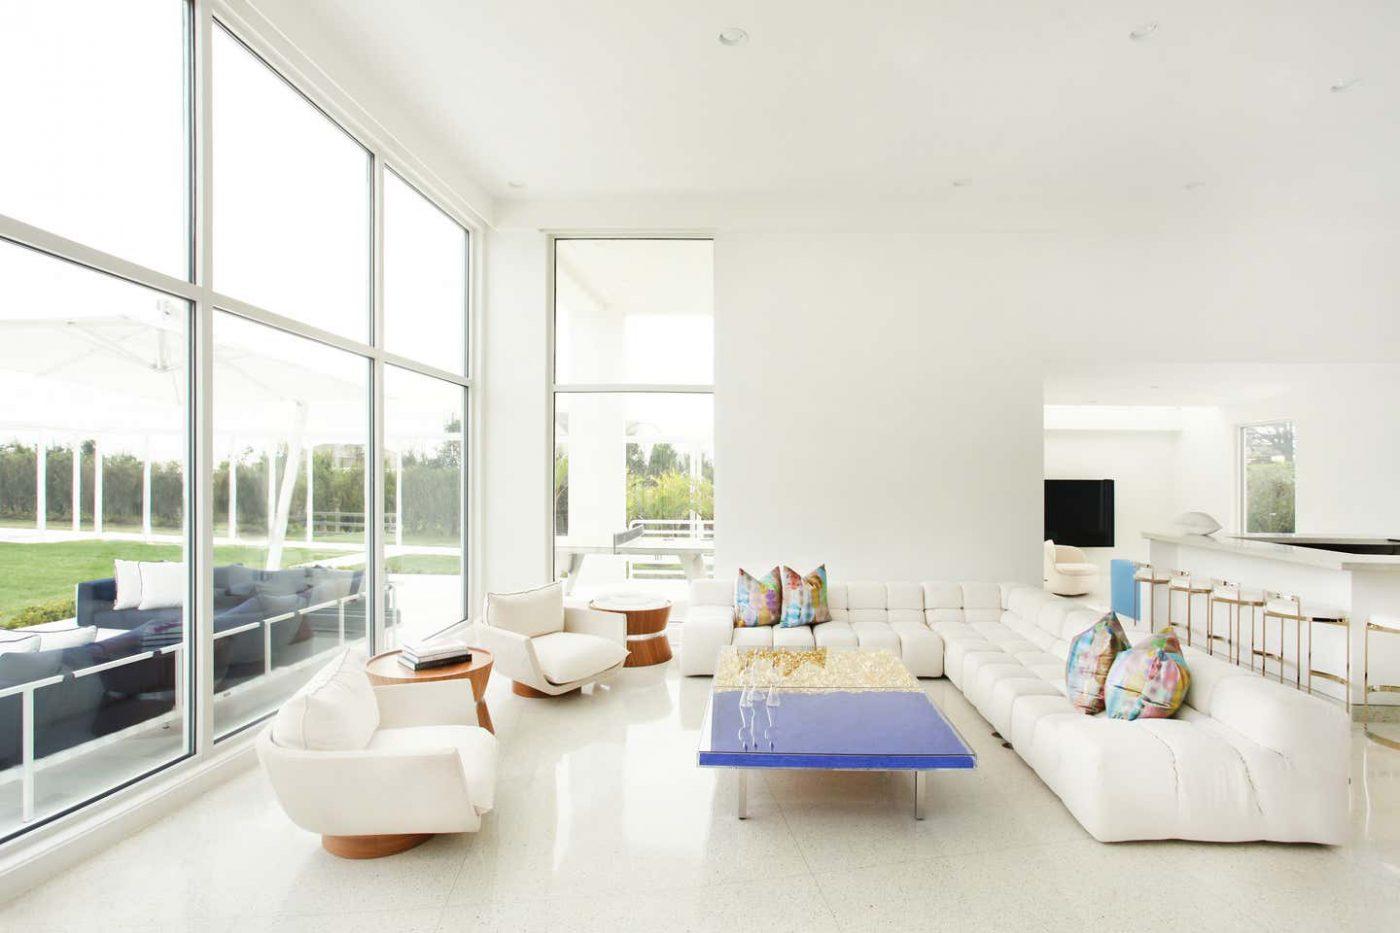 Interior designed by Melanie Morris